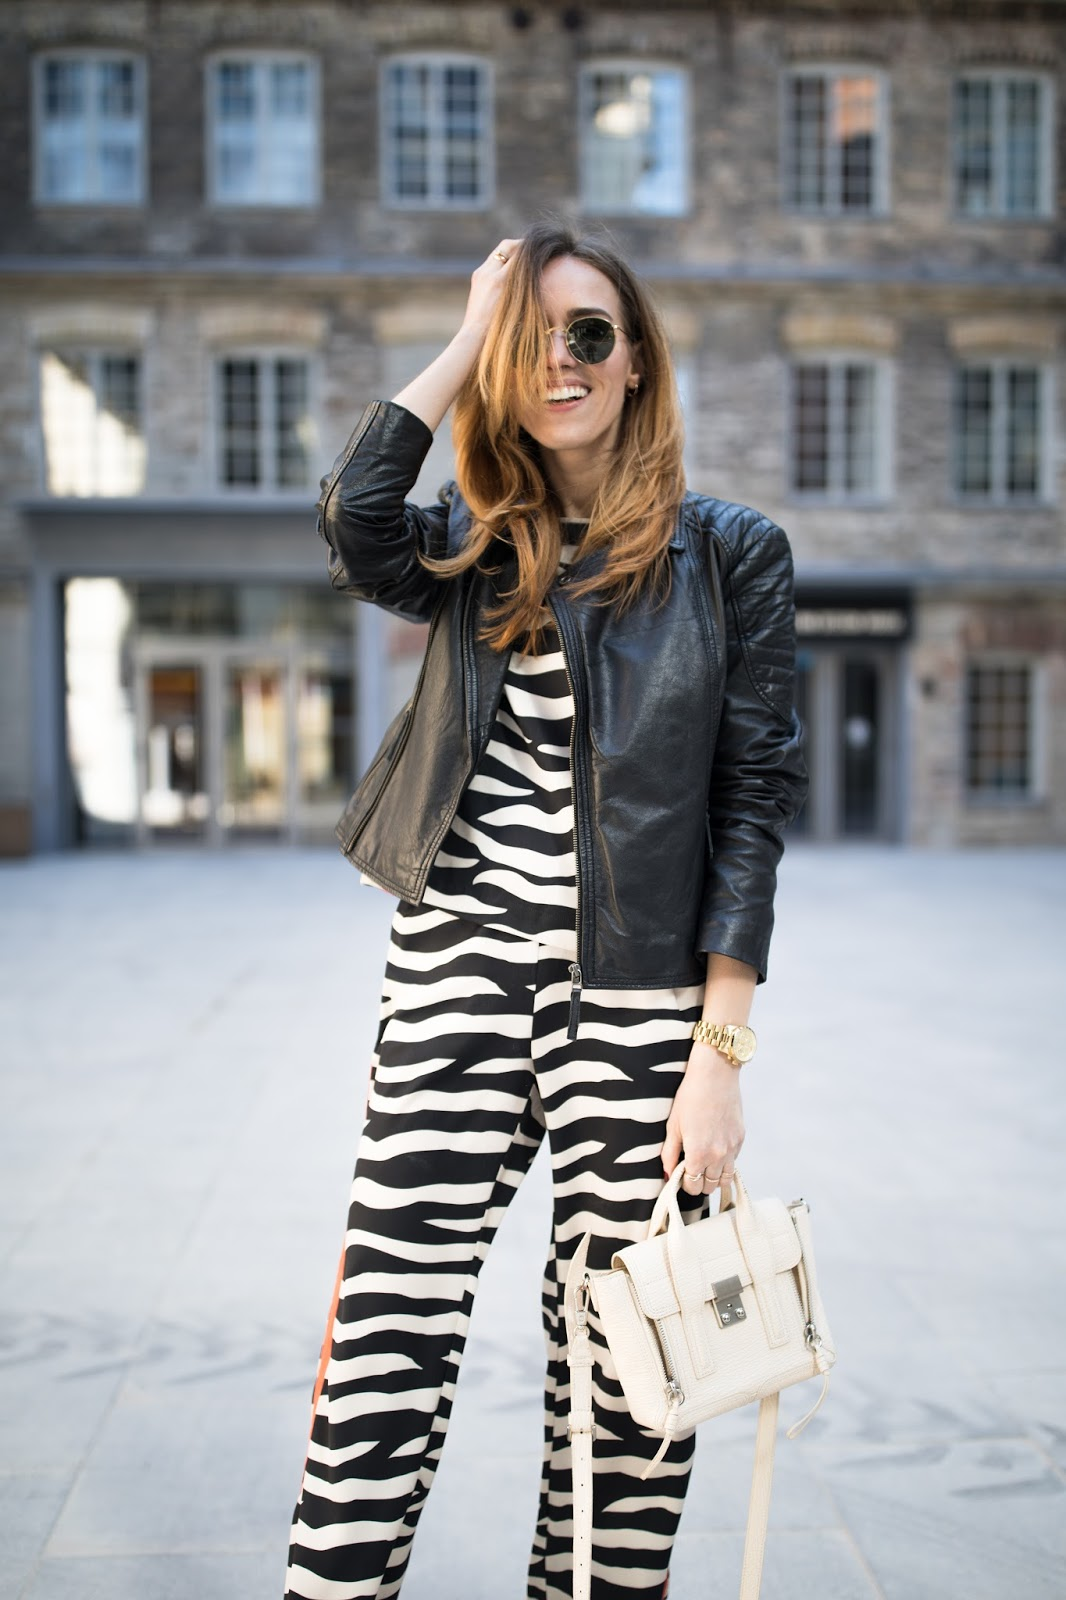 zebra print pyjama outfit